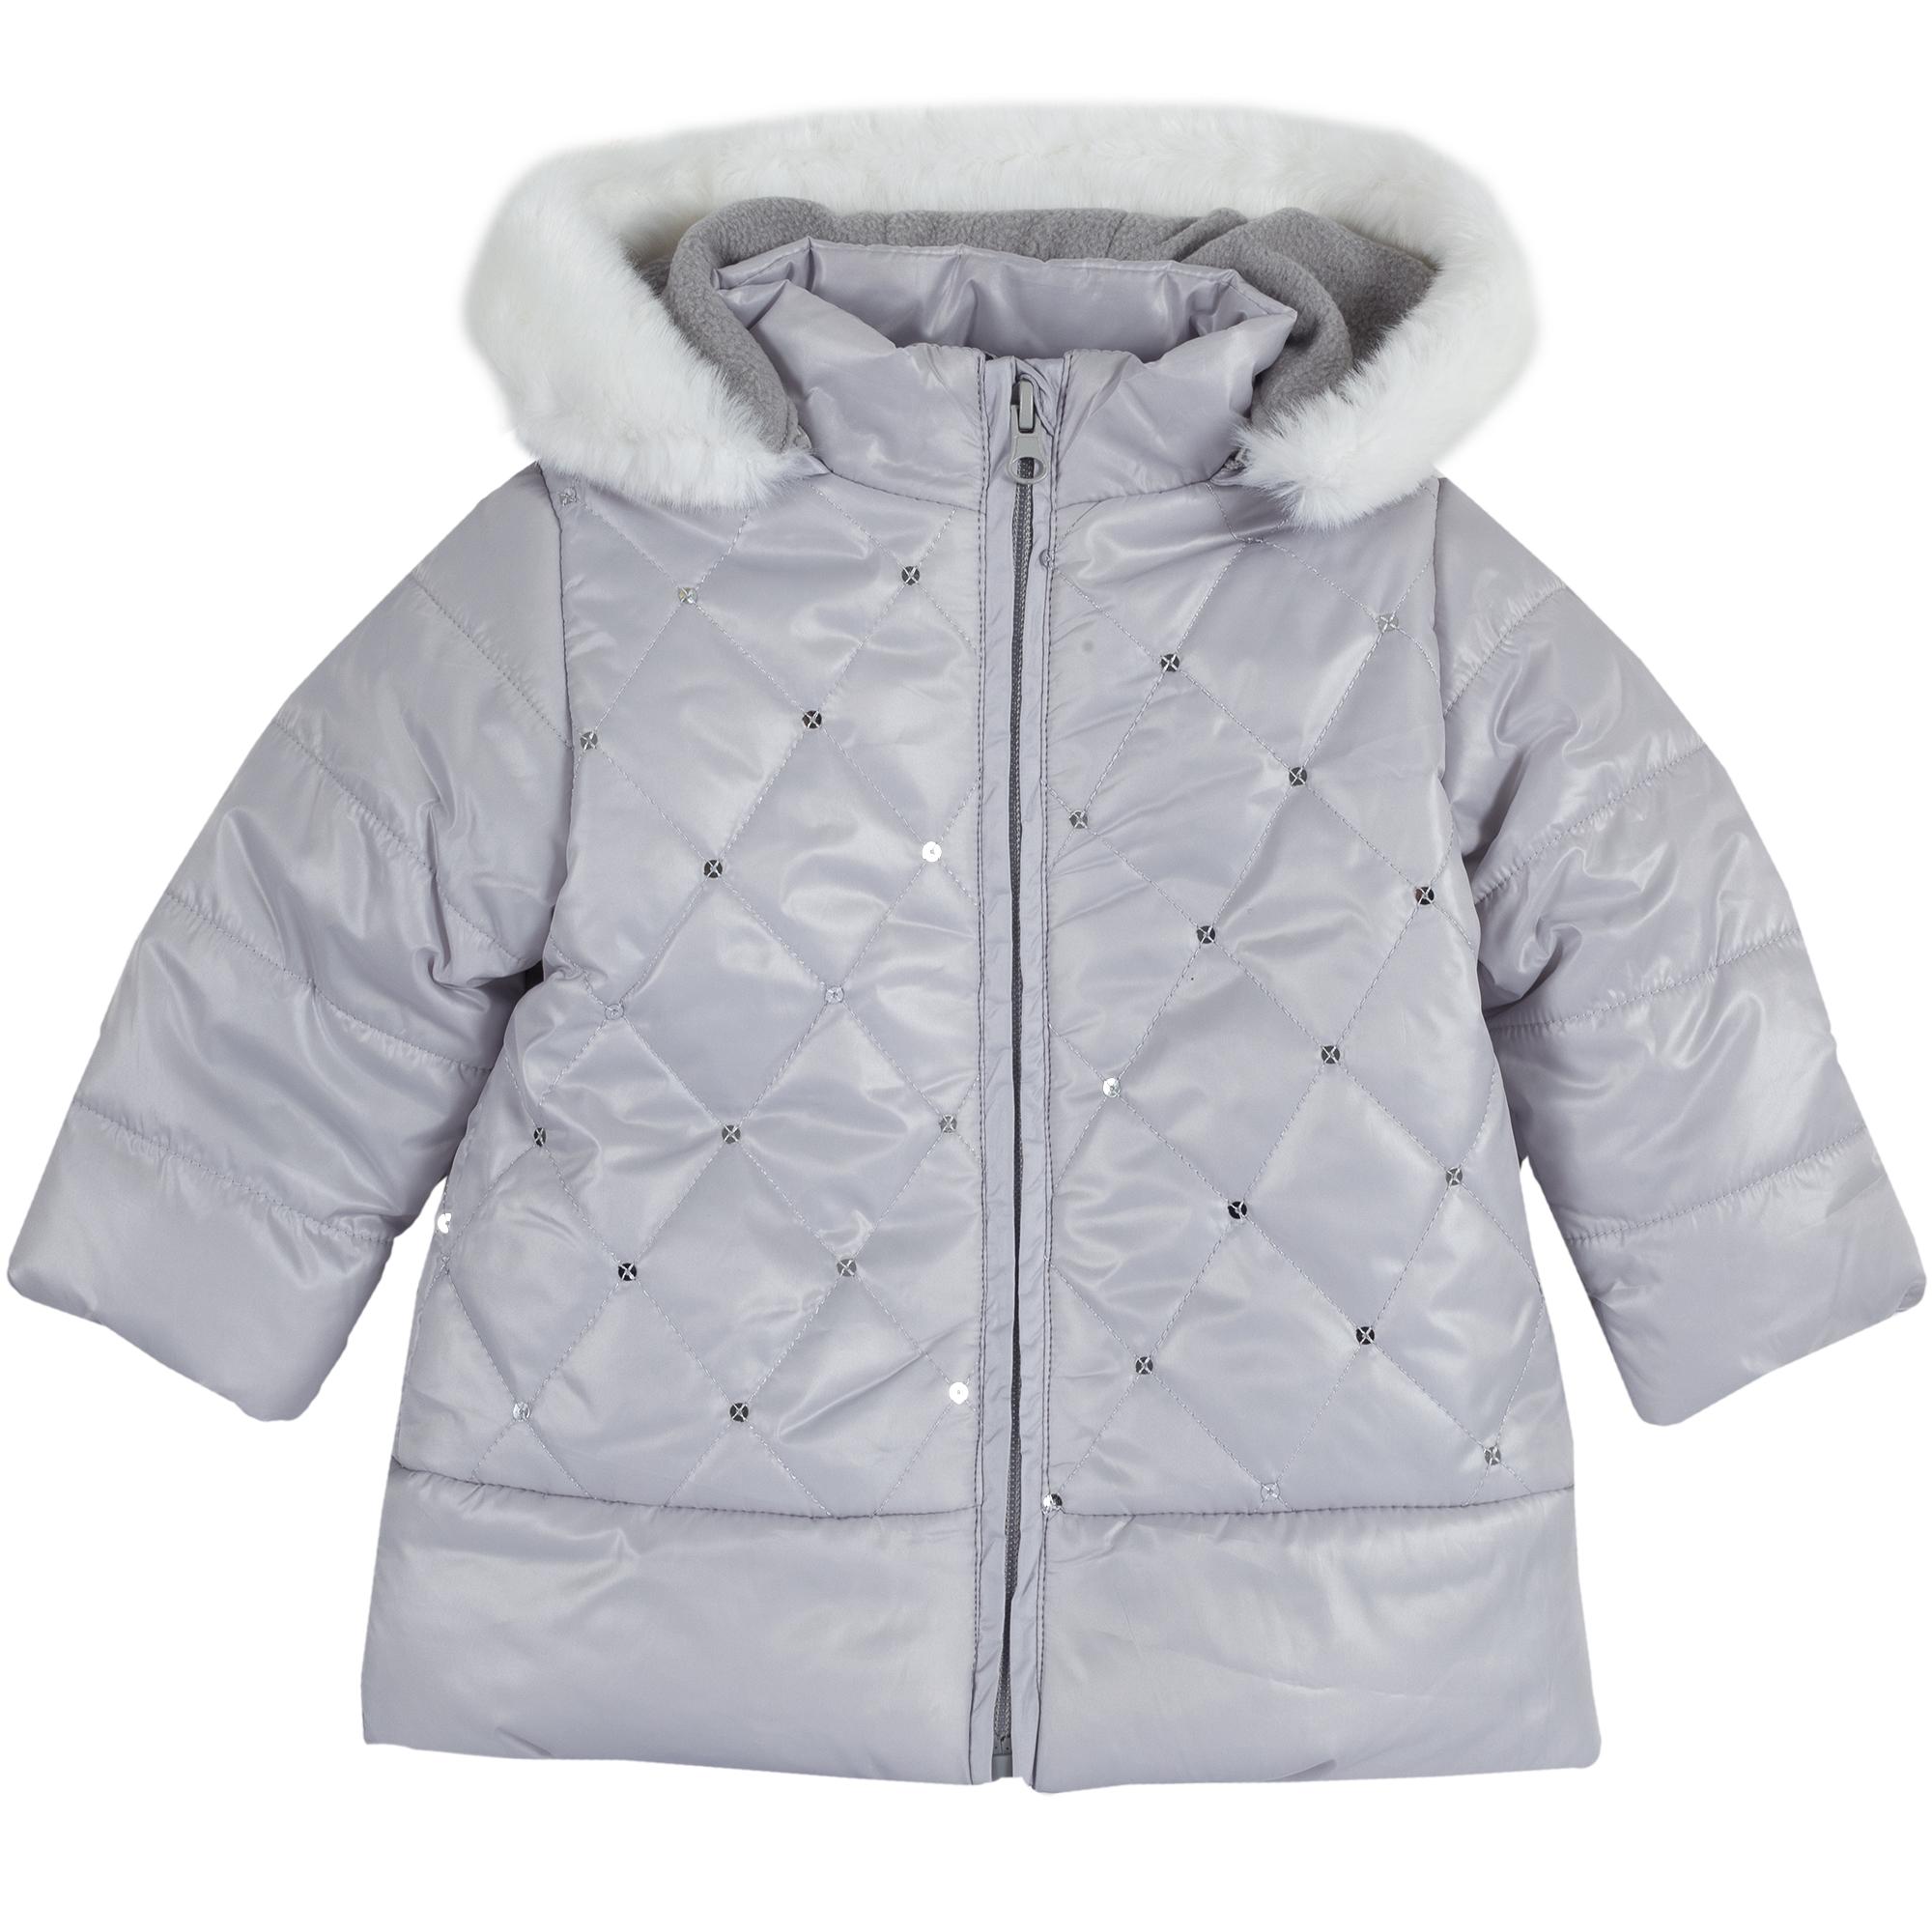 Jacheta copii Chicco Thermosoft, gri, 87163 din categoria Jachete copii